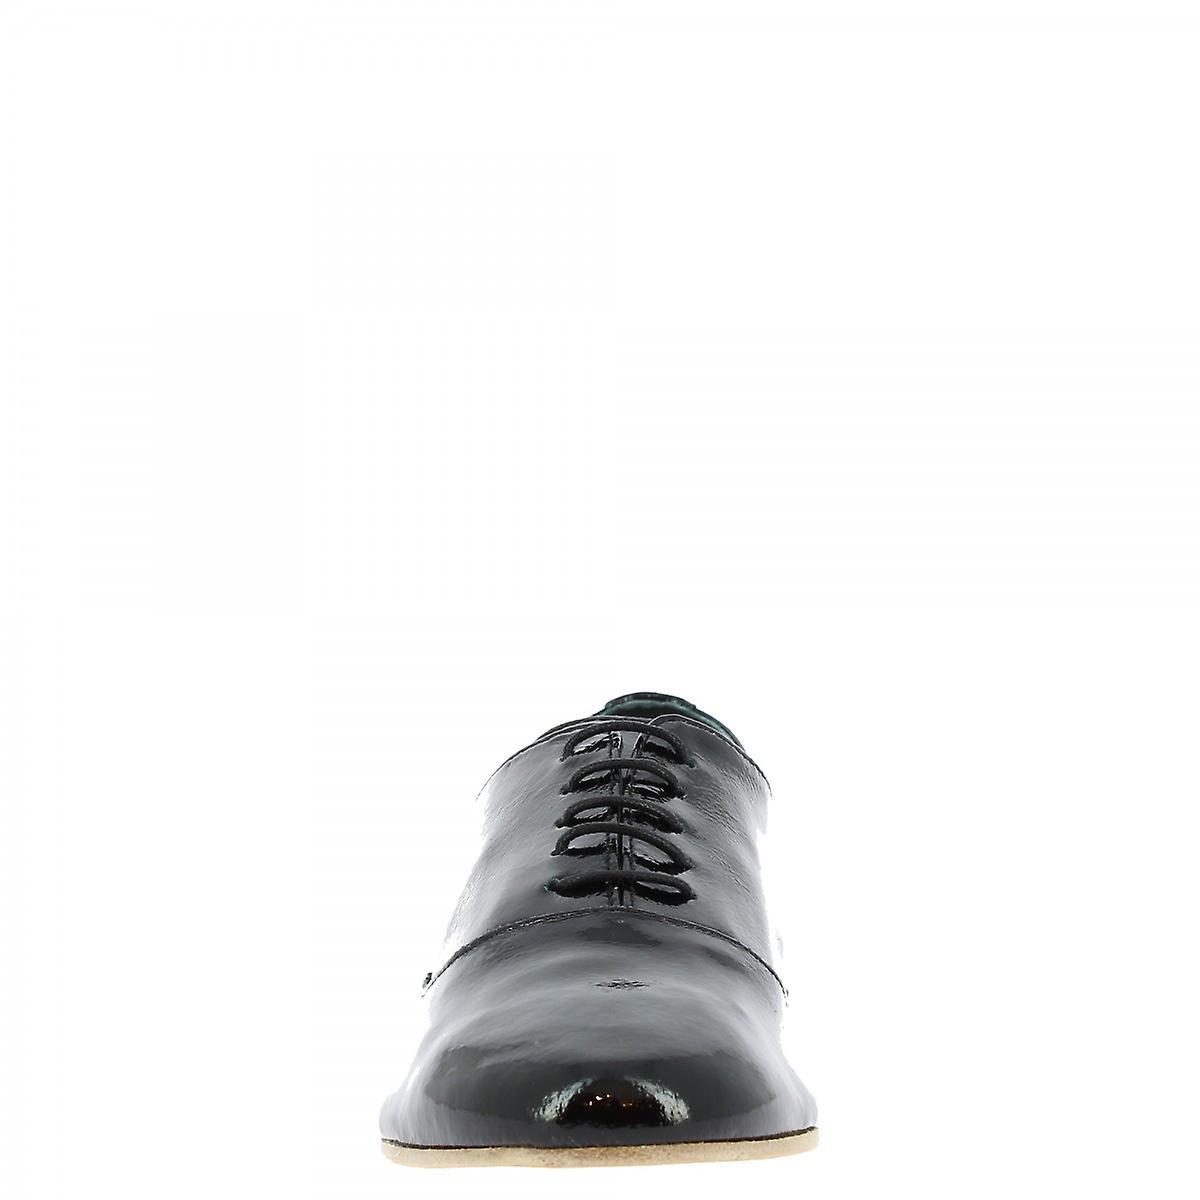 Leonardo Shoes Women's Handmade Elegant Lace-ups In Black Patent Leather